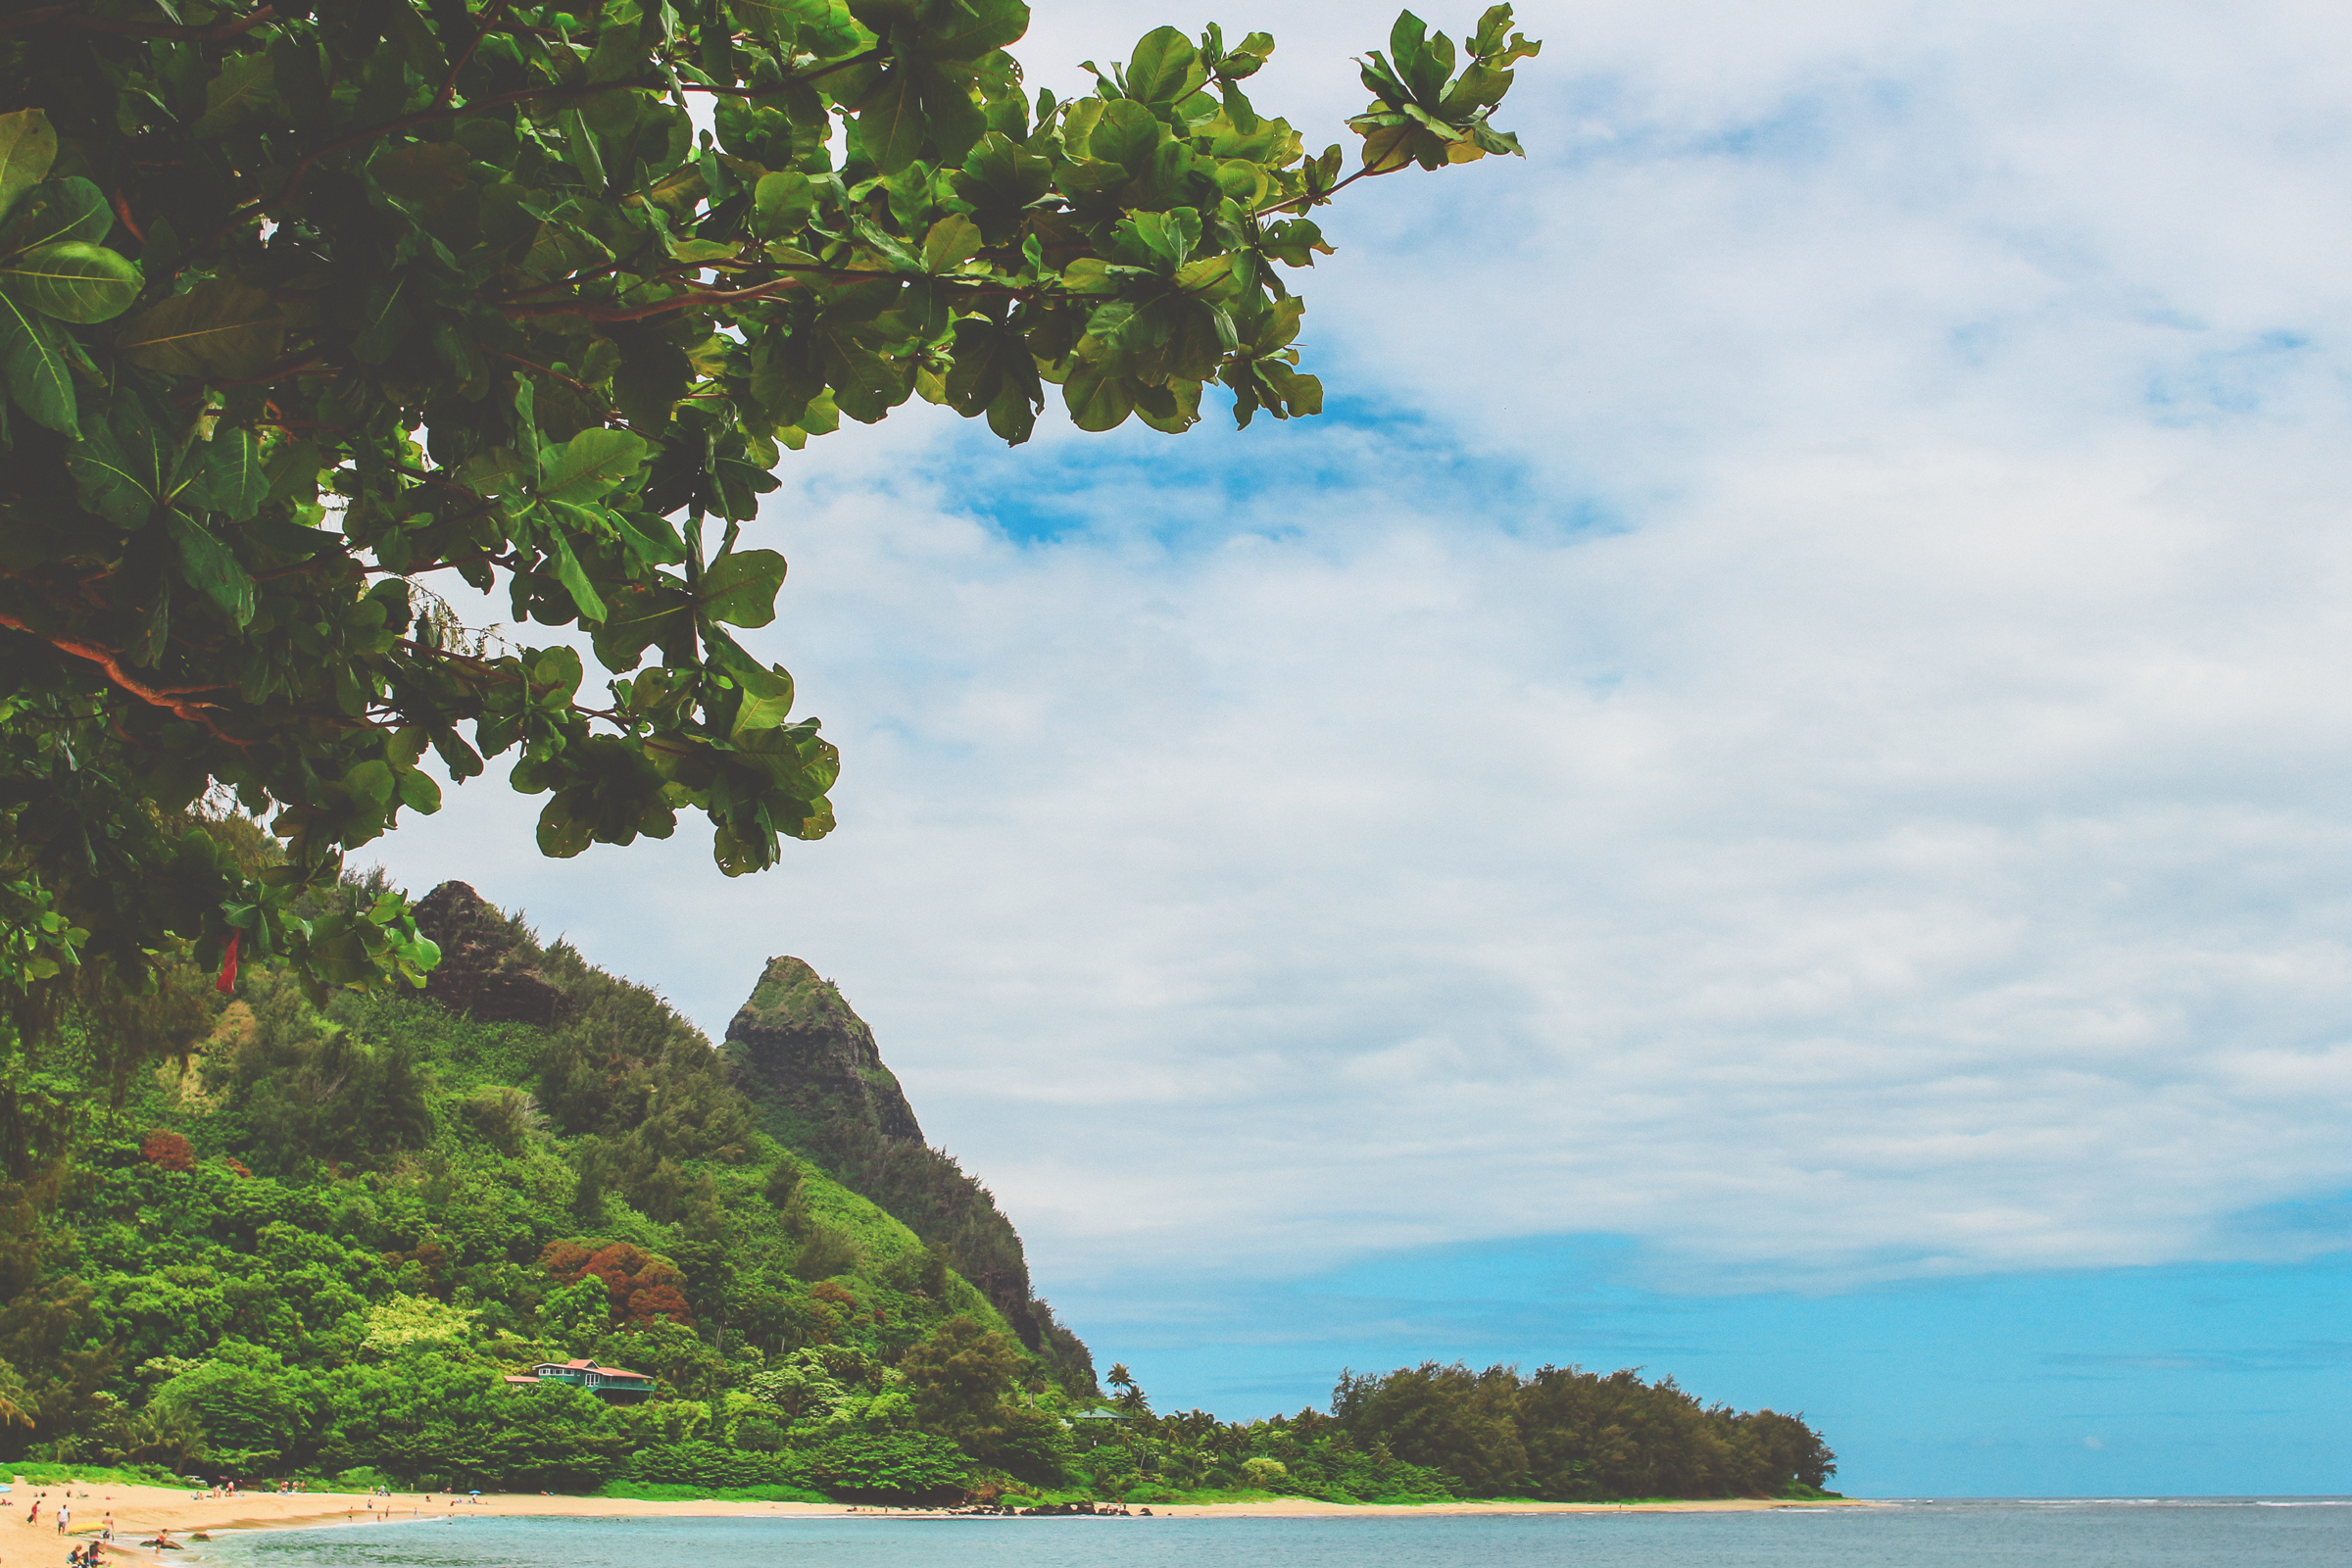 IMG_0170--KAUAI-HAWAII-JENNIFER-PICARD-PHOTOGRAPHY.jpg